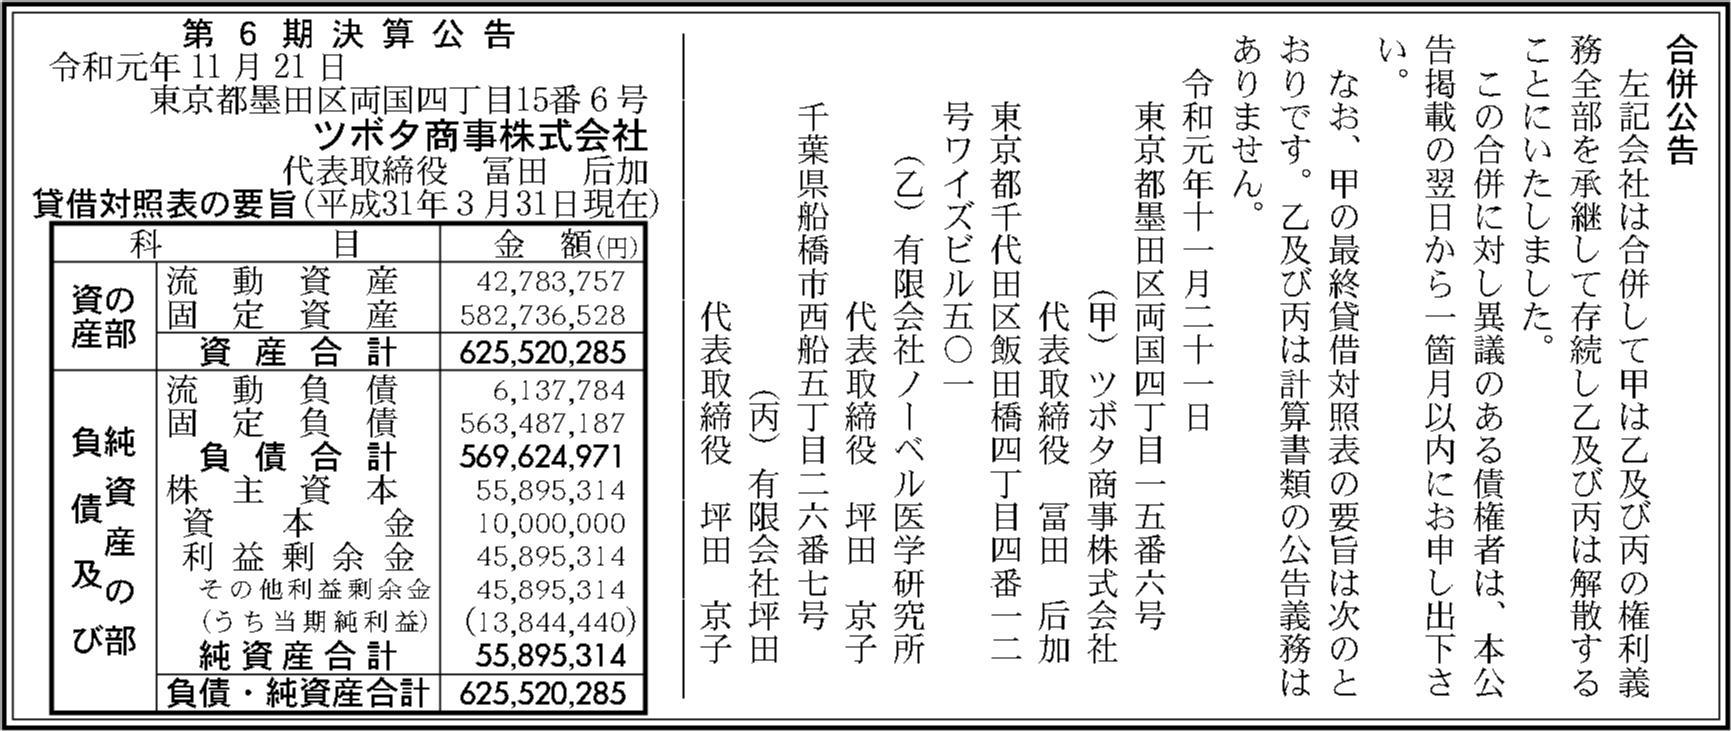 0219 bfd7fff7eddf9ac994a57fd41892fad22f06d85769cf40f428fce93981c69ecc1cd6af9394e00cdb80ec87717a626cf005f035a9a2966a0ba88e42c5711b73f3 01